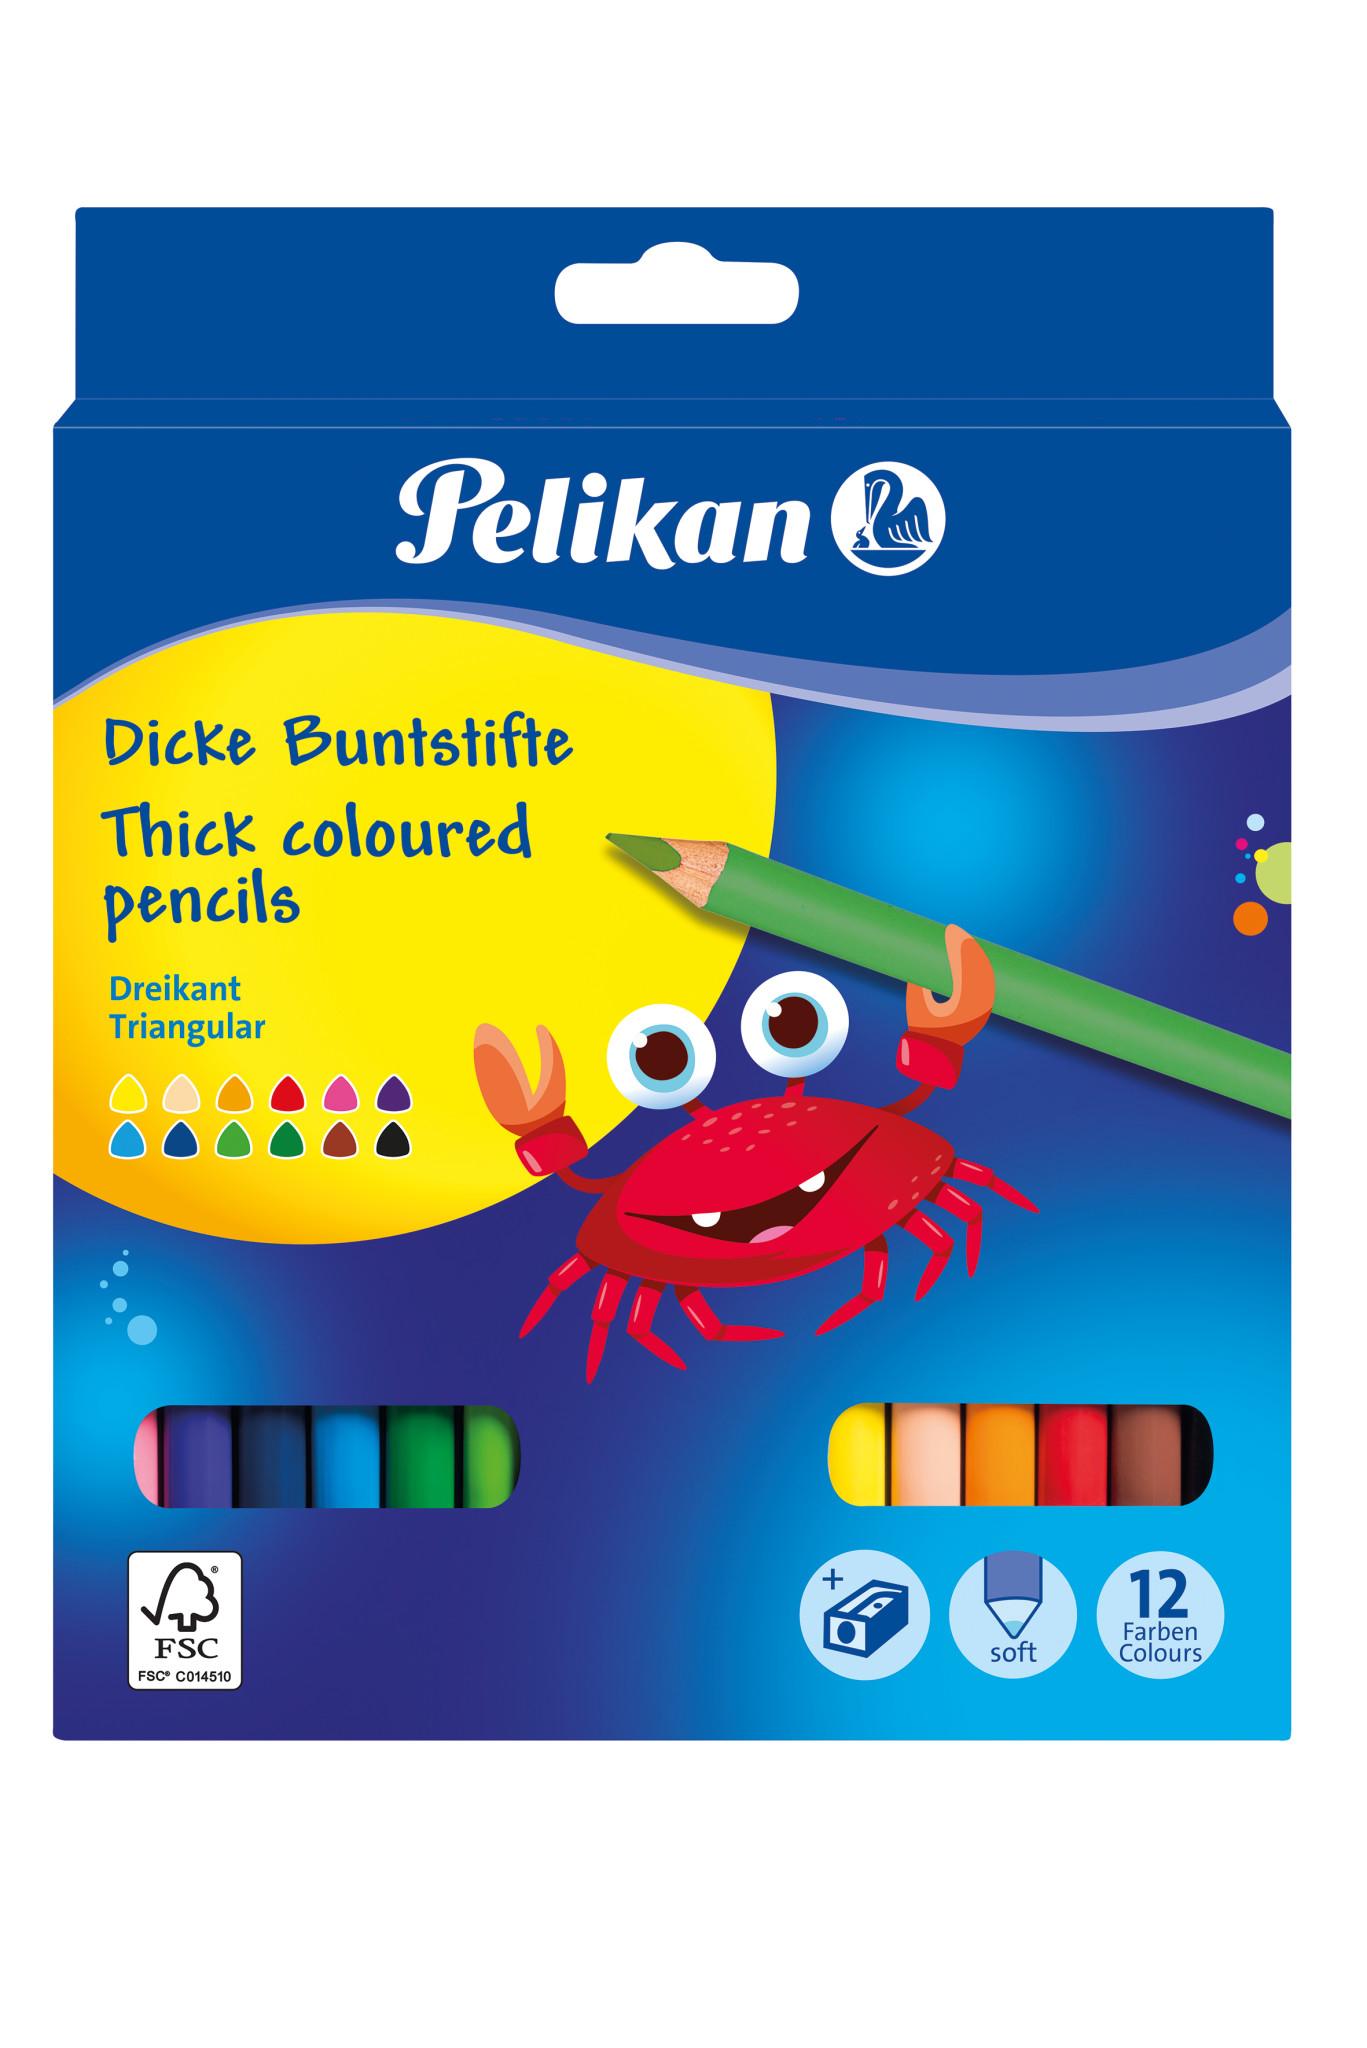 Pelikan 700160 - Dicke Buntstifte - 12 Stück